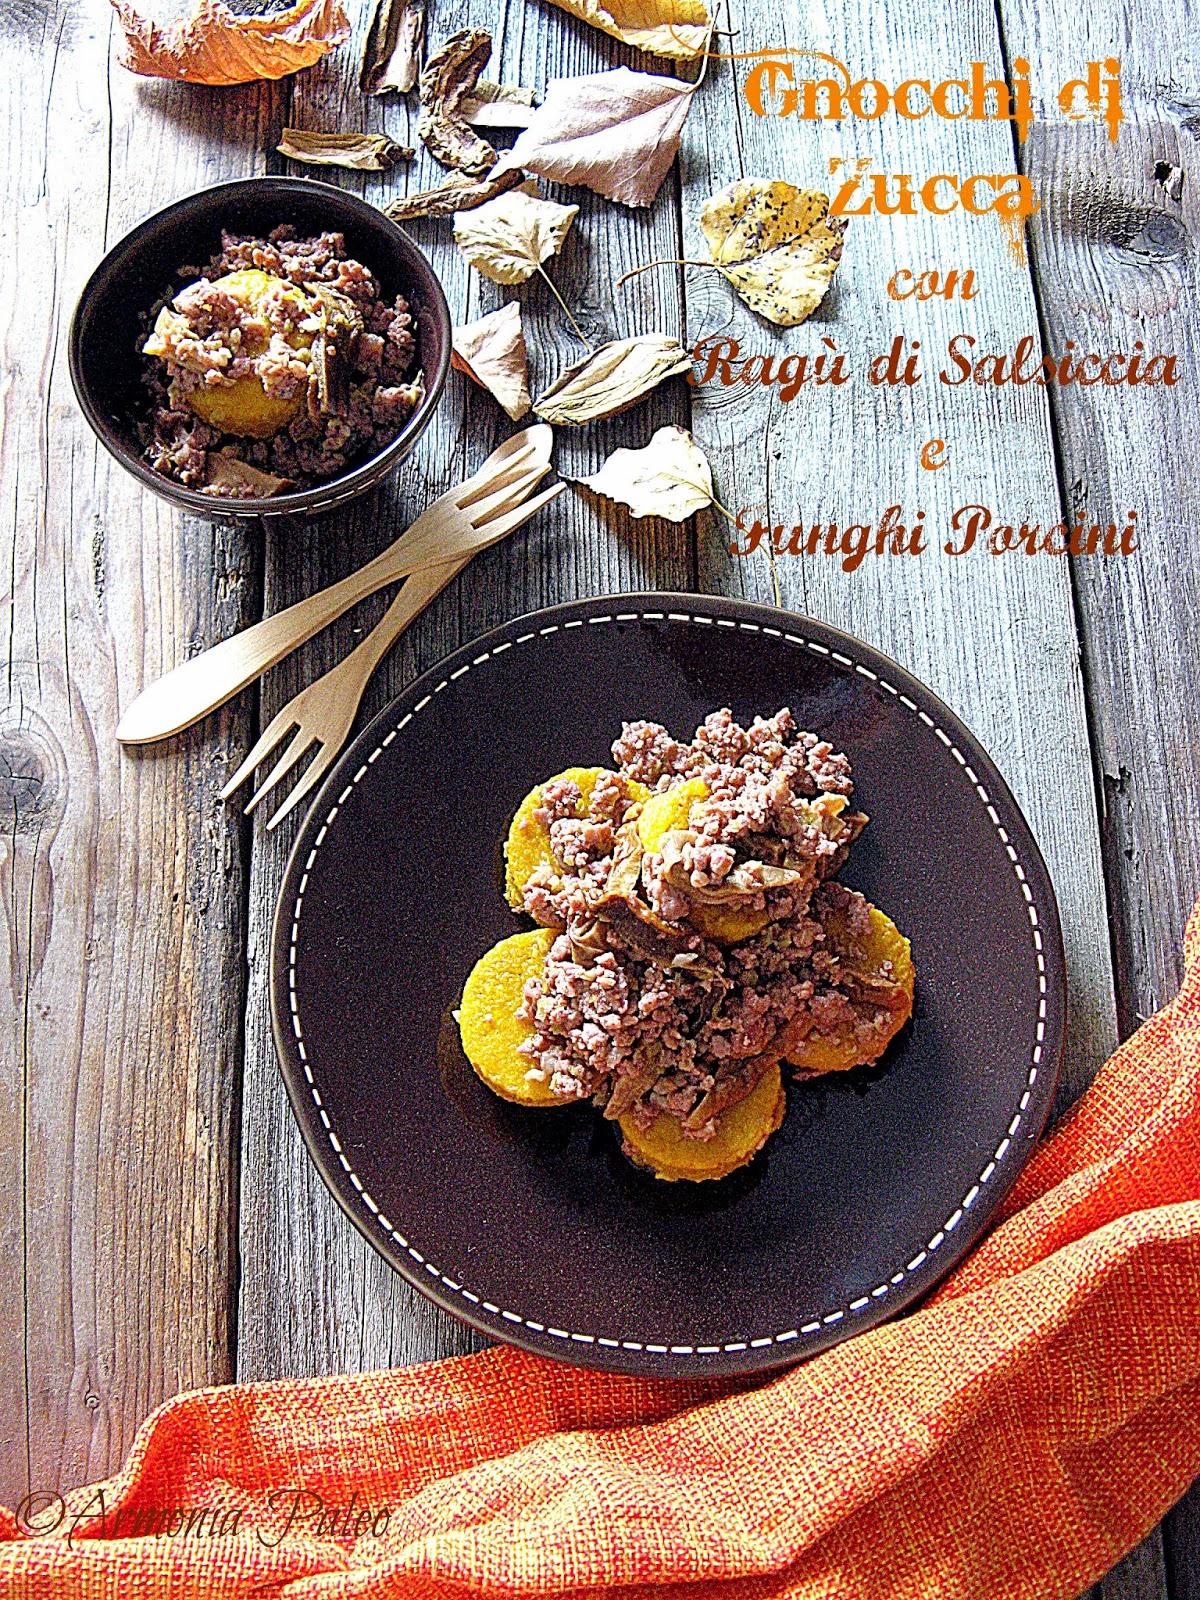 Gnocchi di Zucca con Ragù di Salsiccia e Funghi Porcini di Armonia Paleo